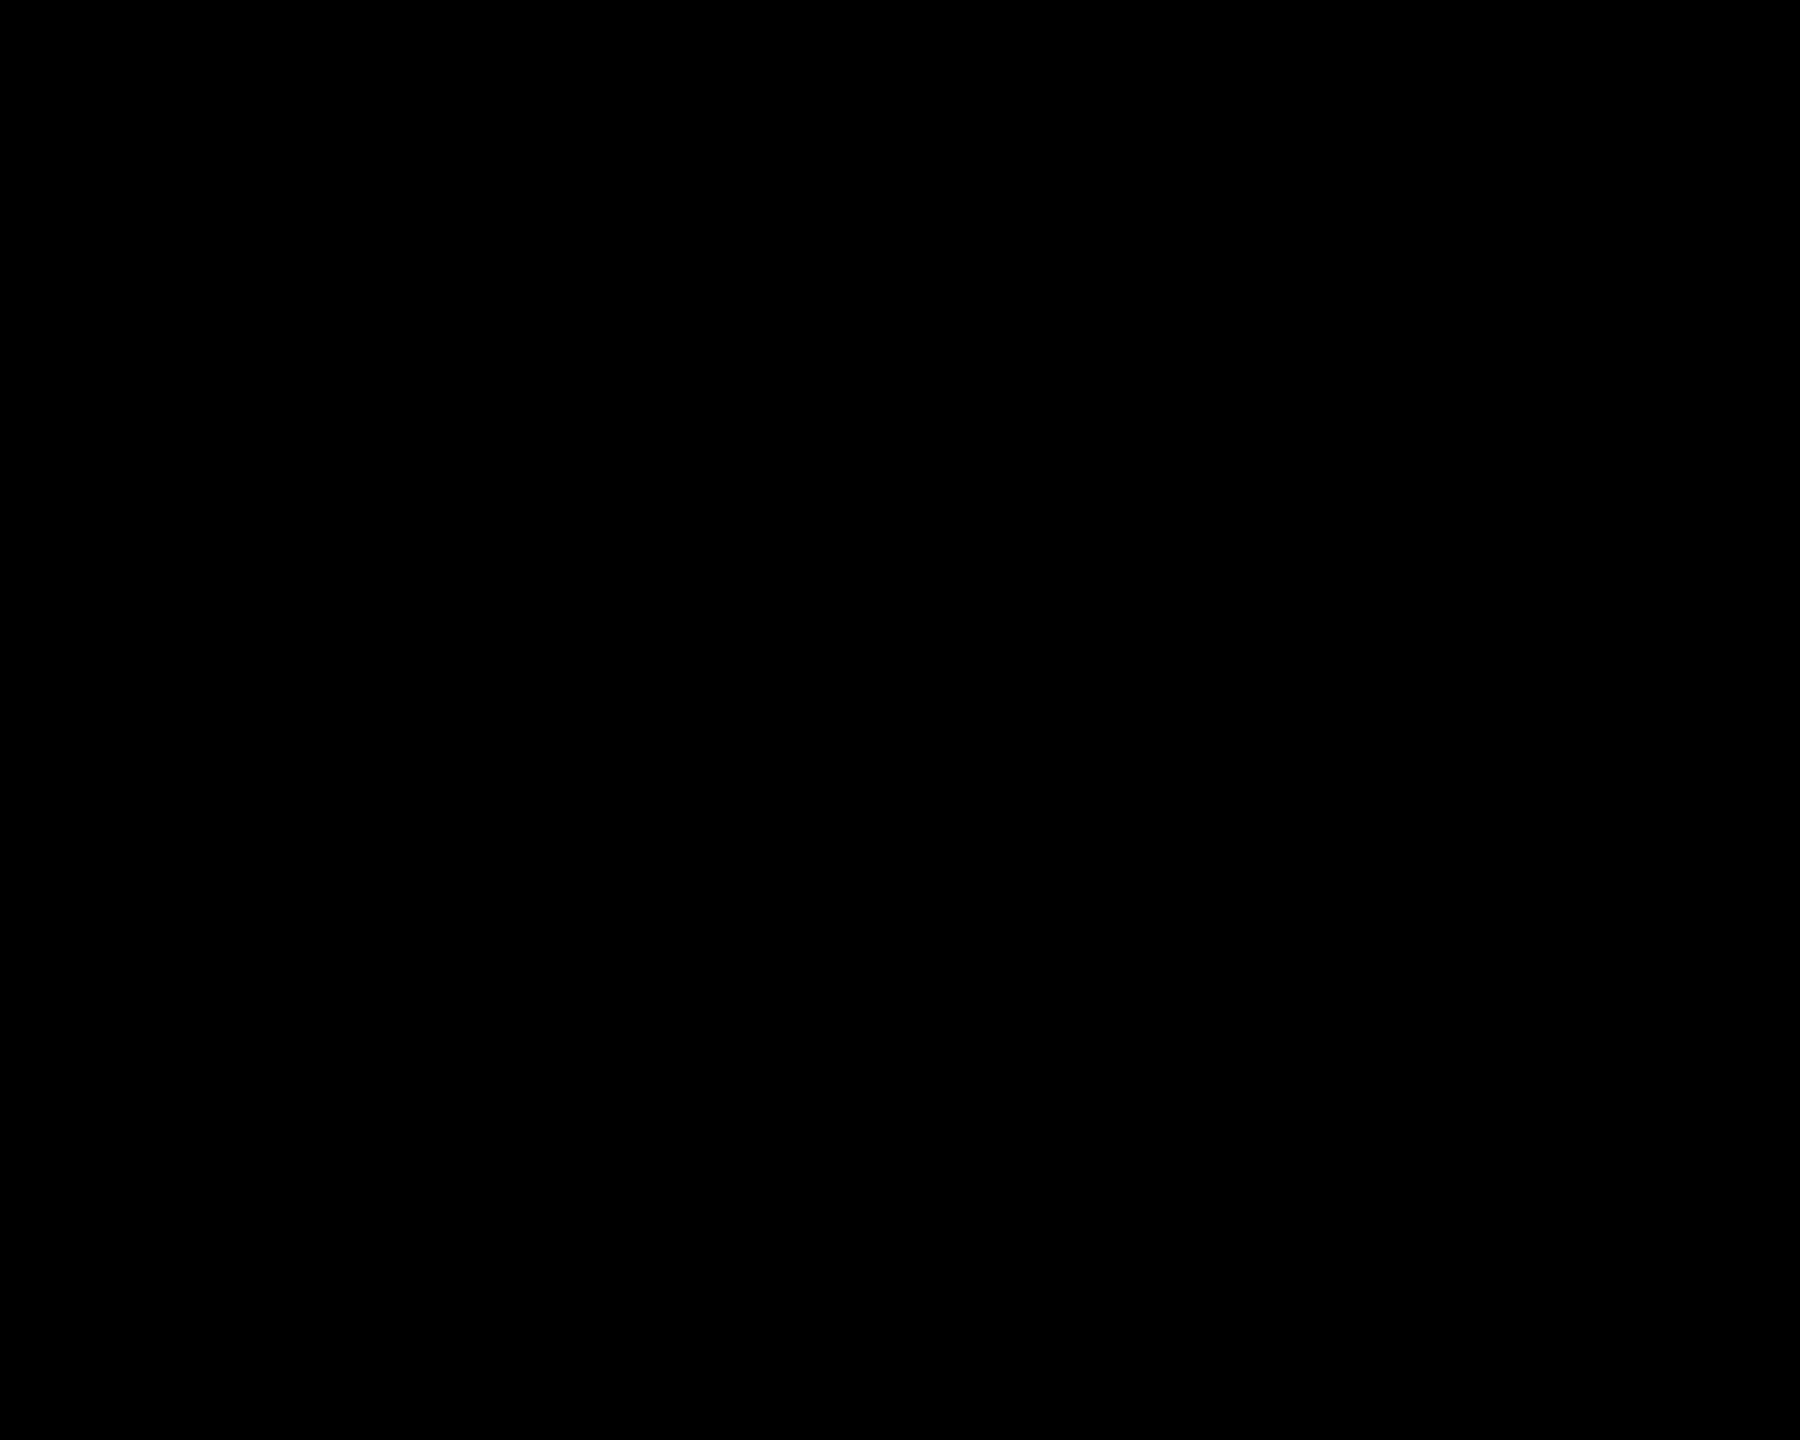 refuelgroup-sml